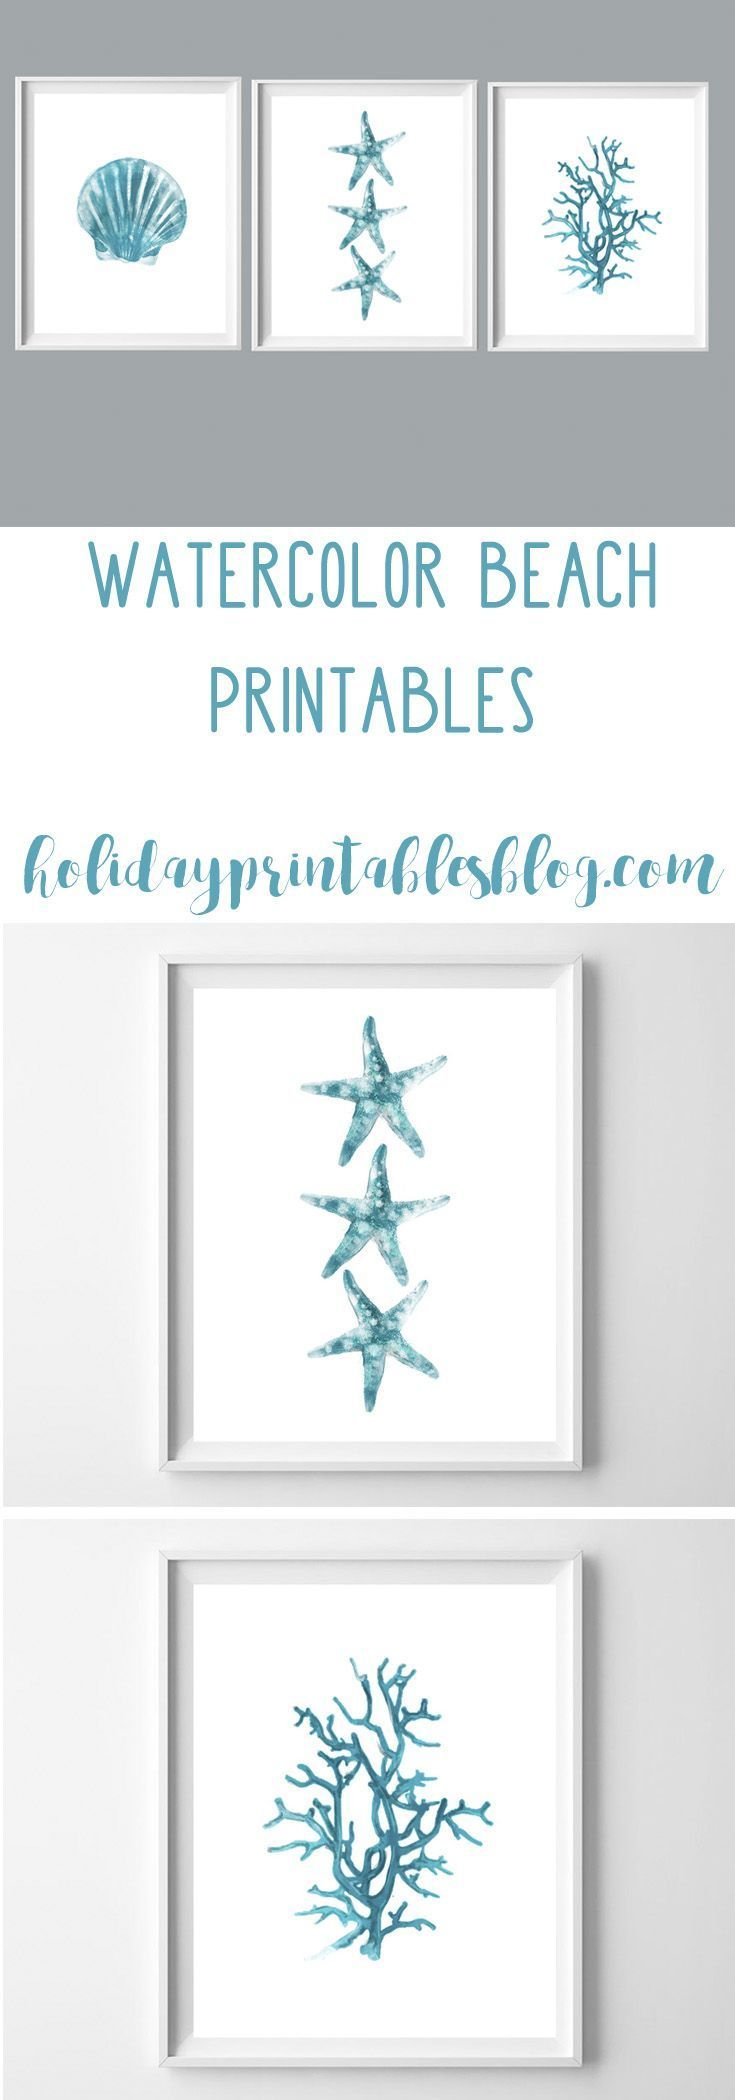 turquoise watercolor beach printable art -   24 nautical decor printable ideas